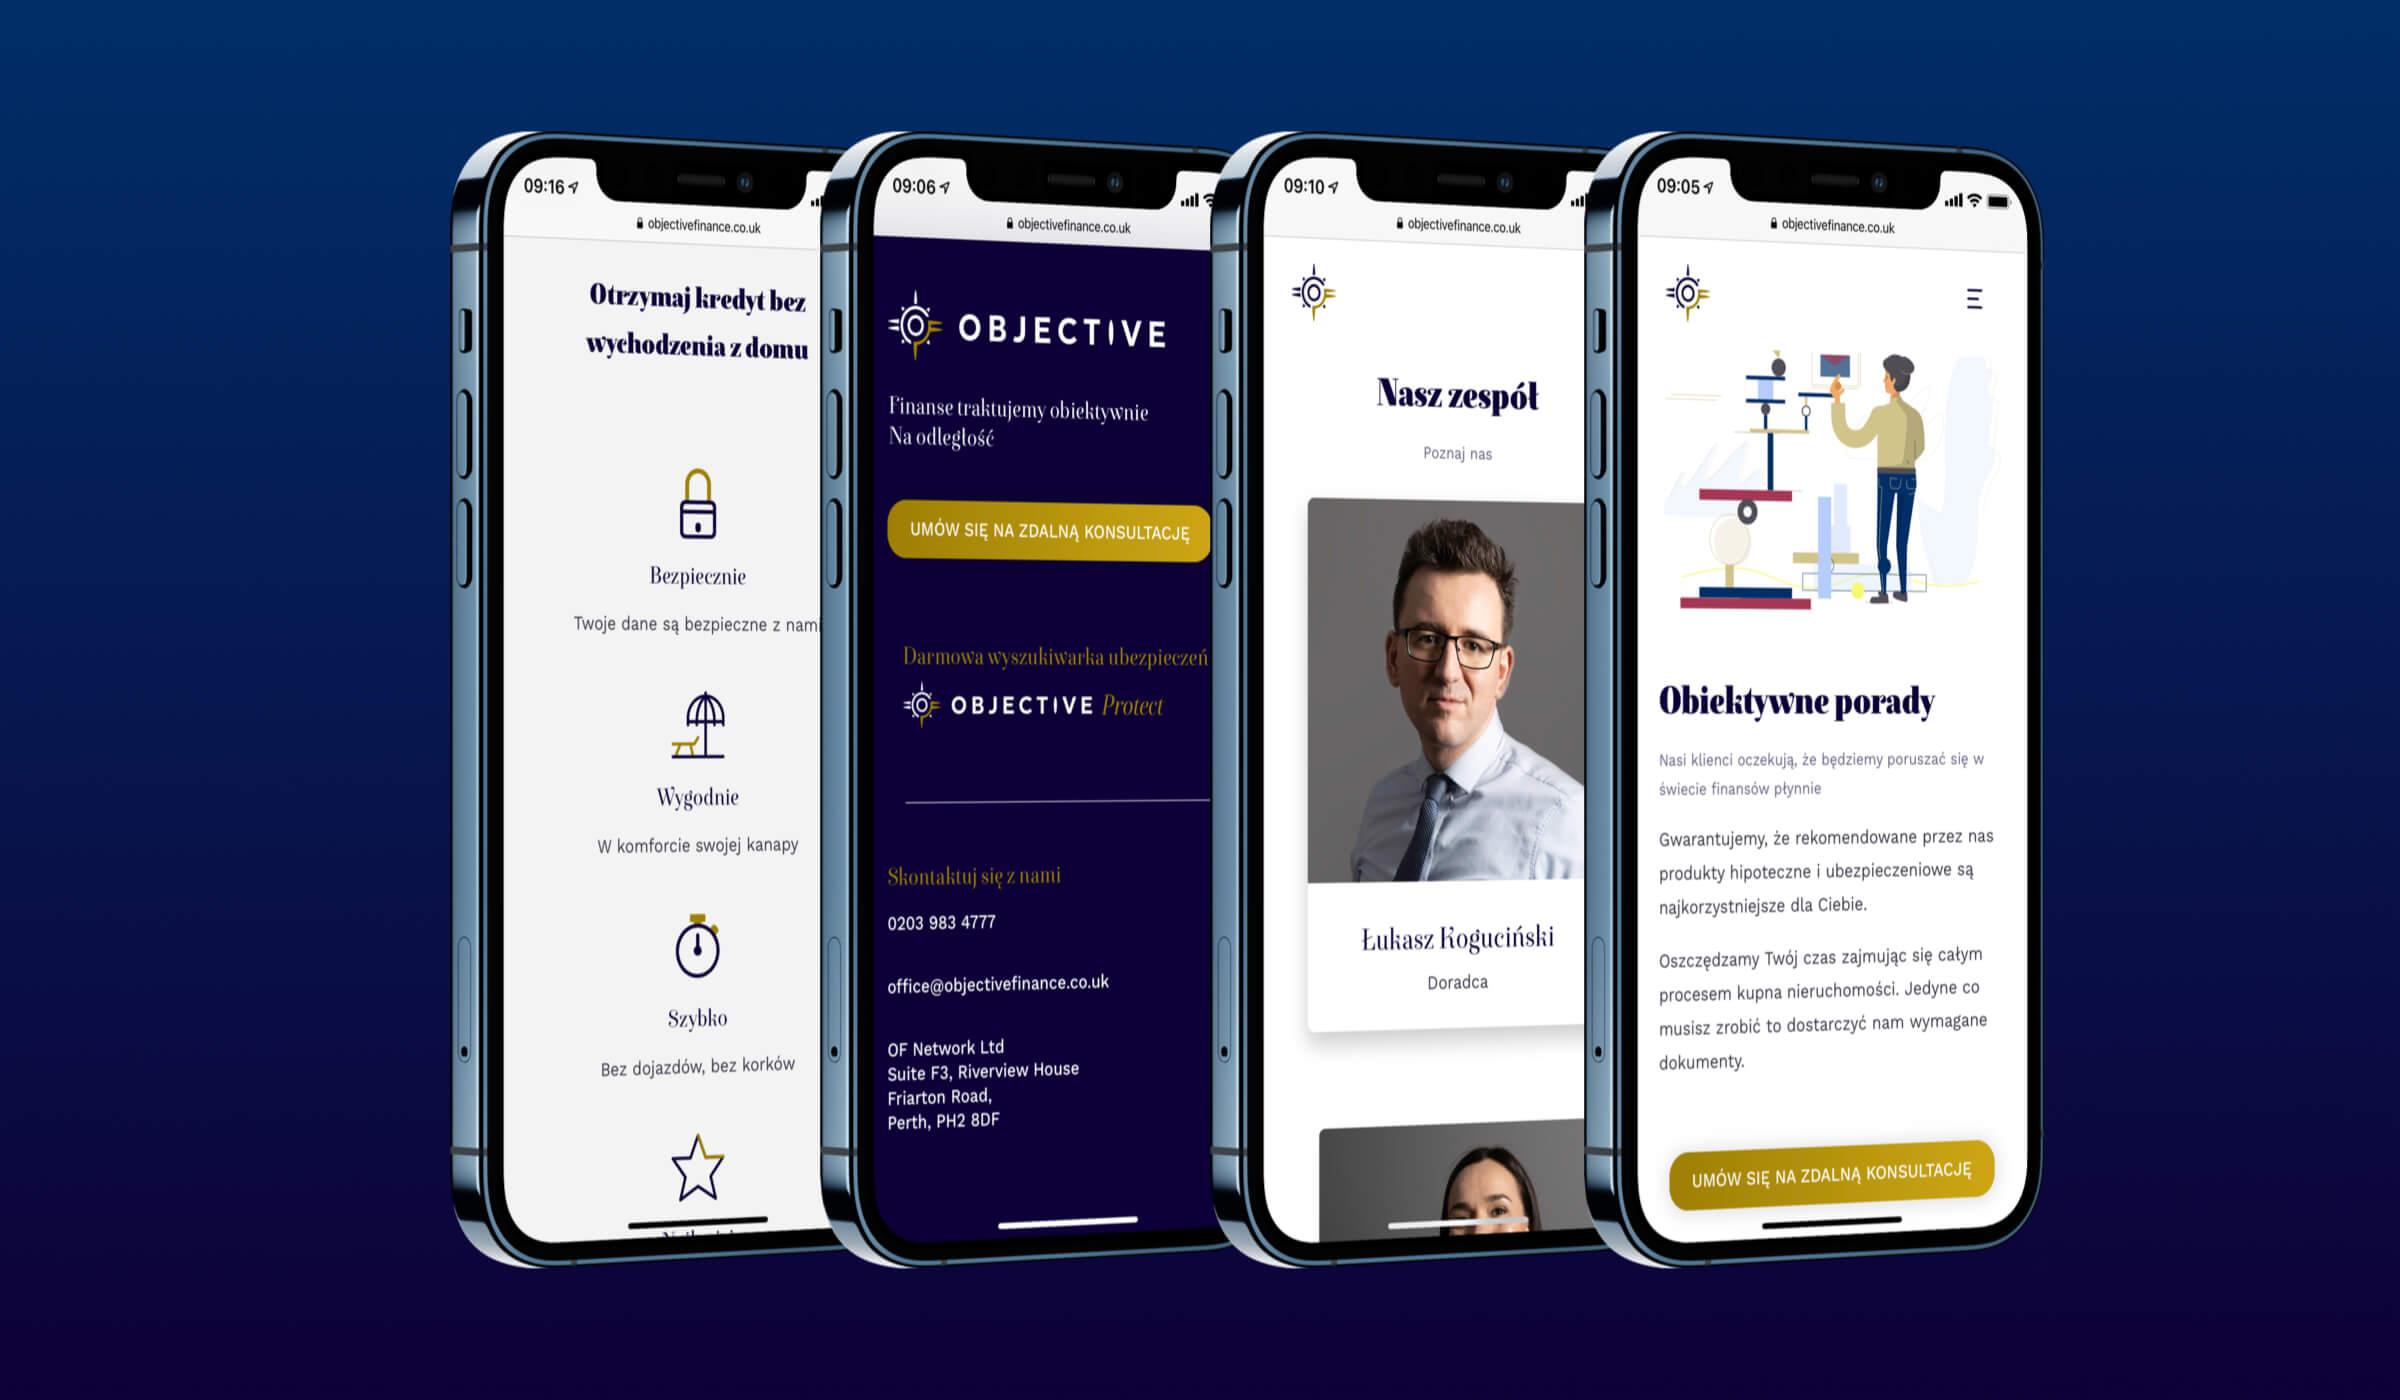 Objective Finance strona mobilna 4 widoki na iPhone